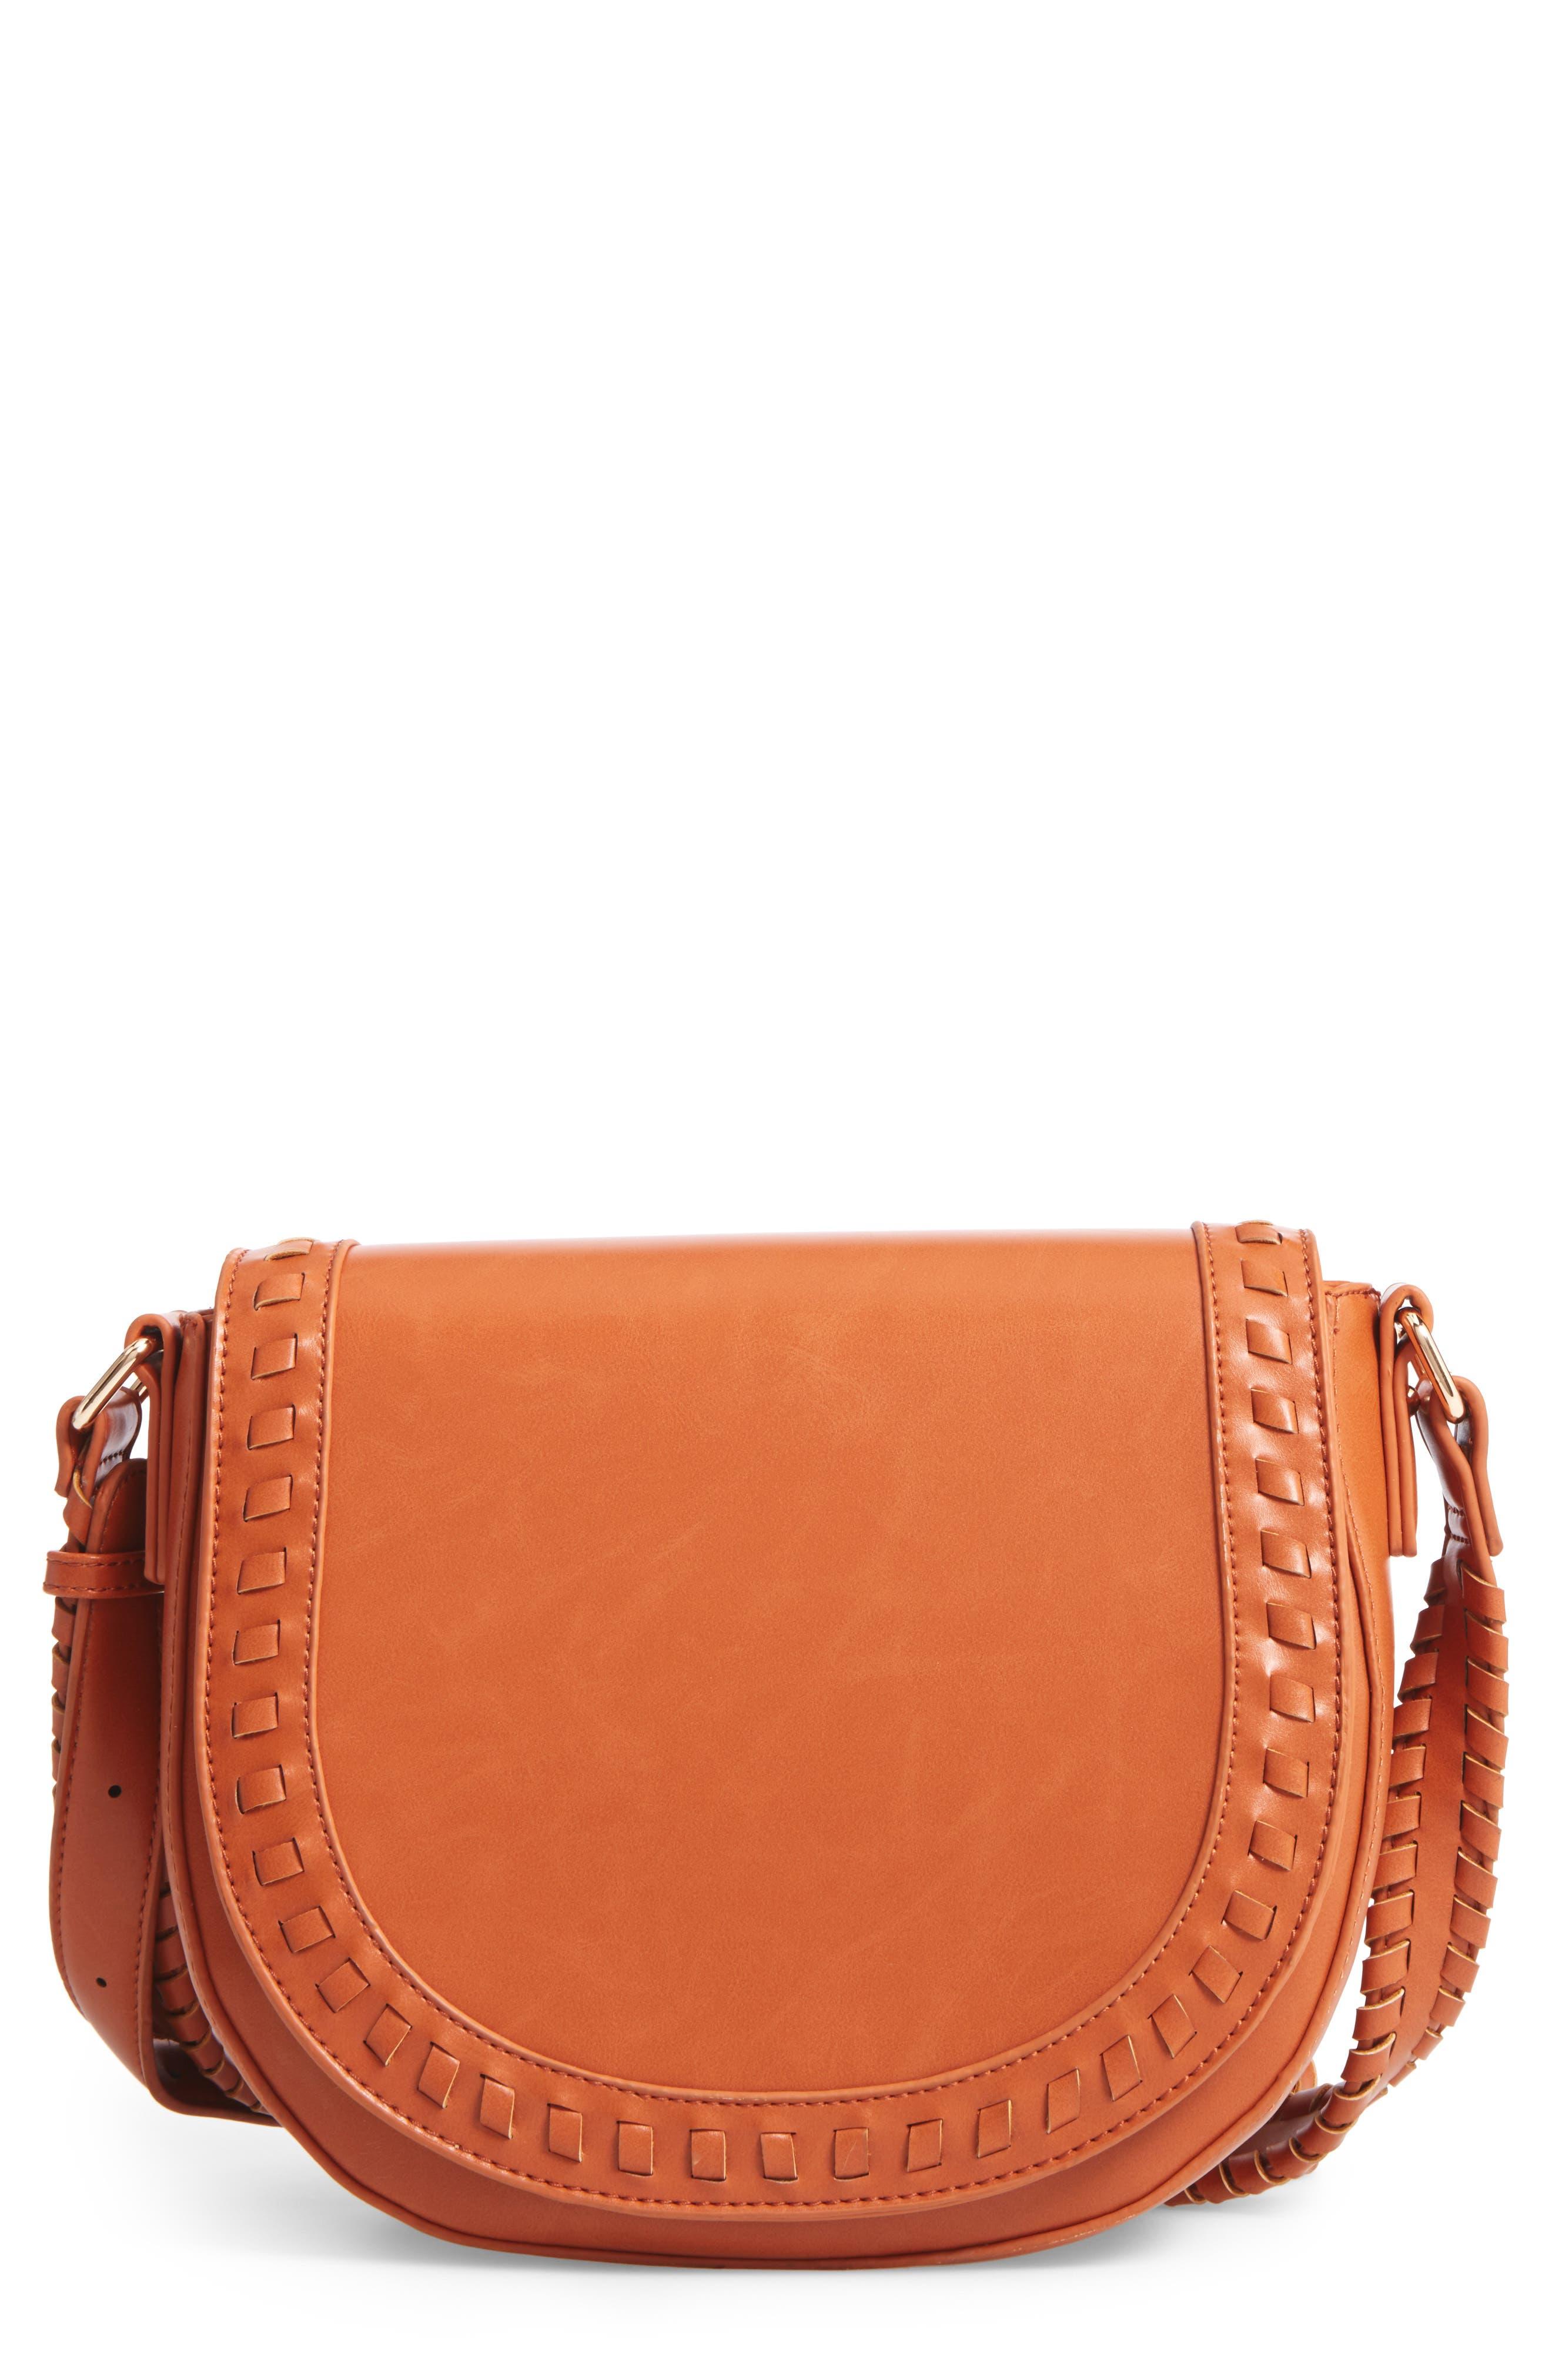 Sole Society Clovey Faux Leather Saddlebag